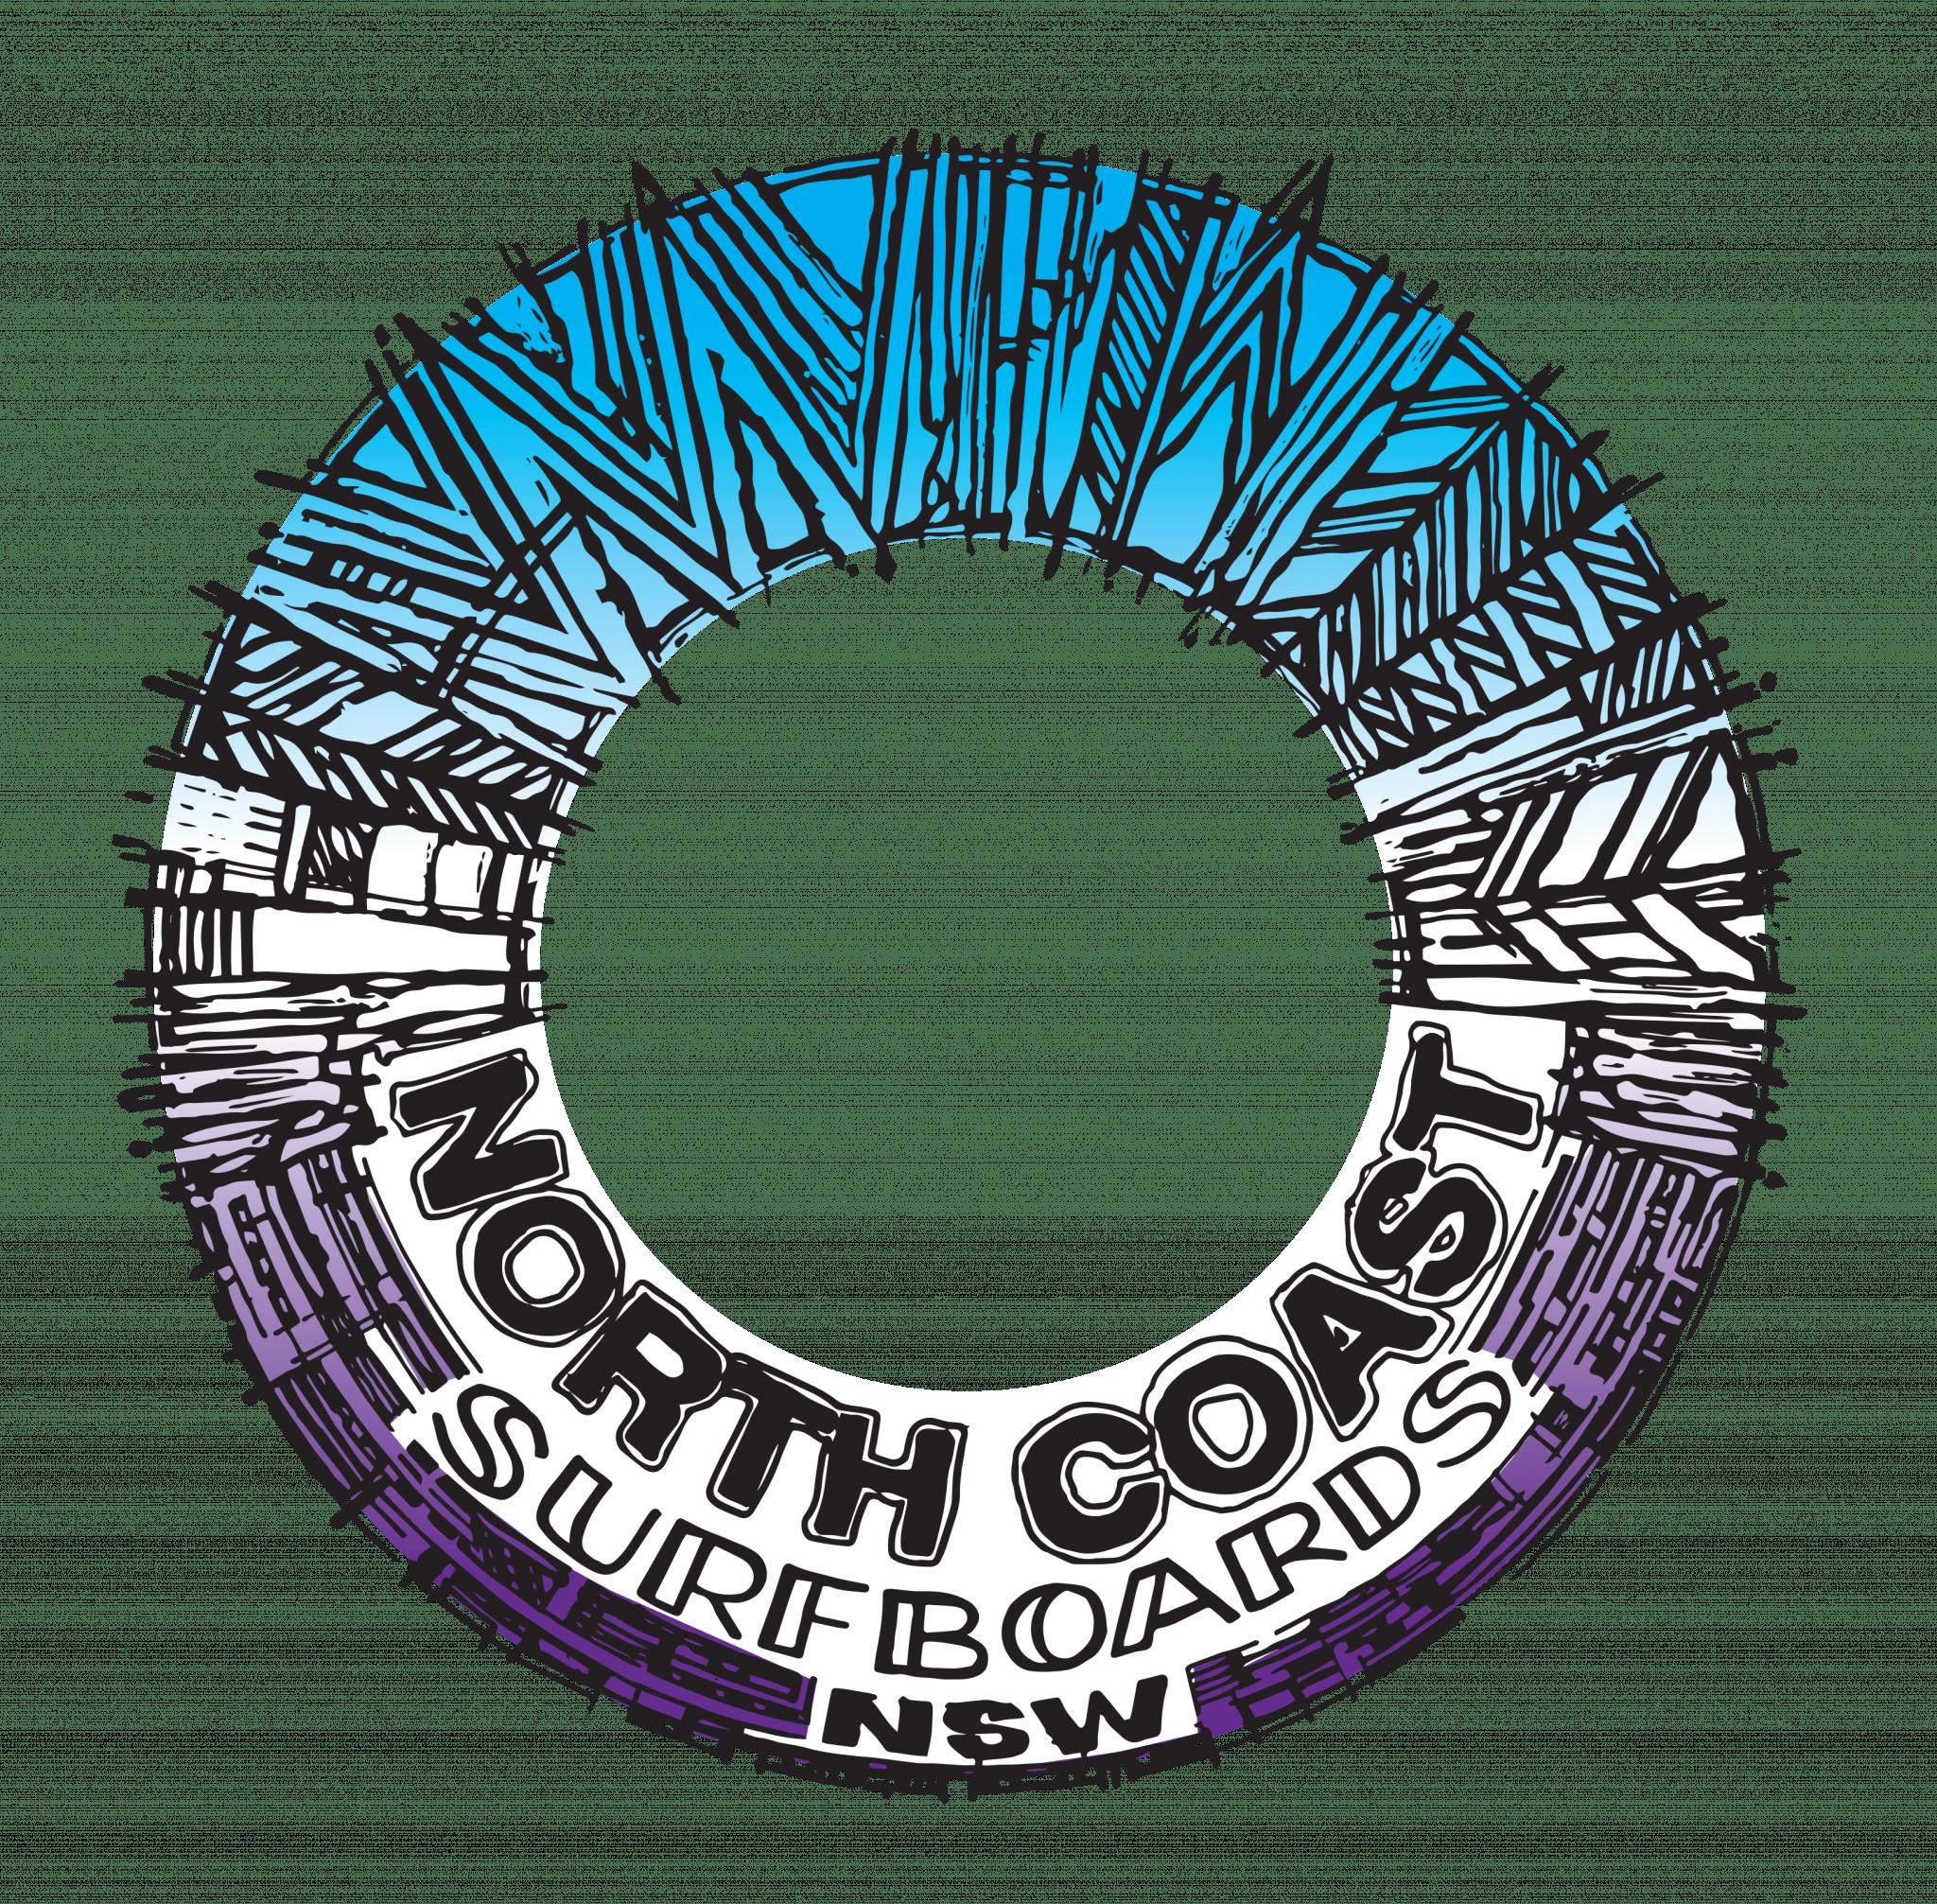 North Coast Surfboards